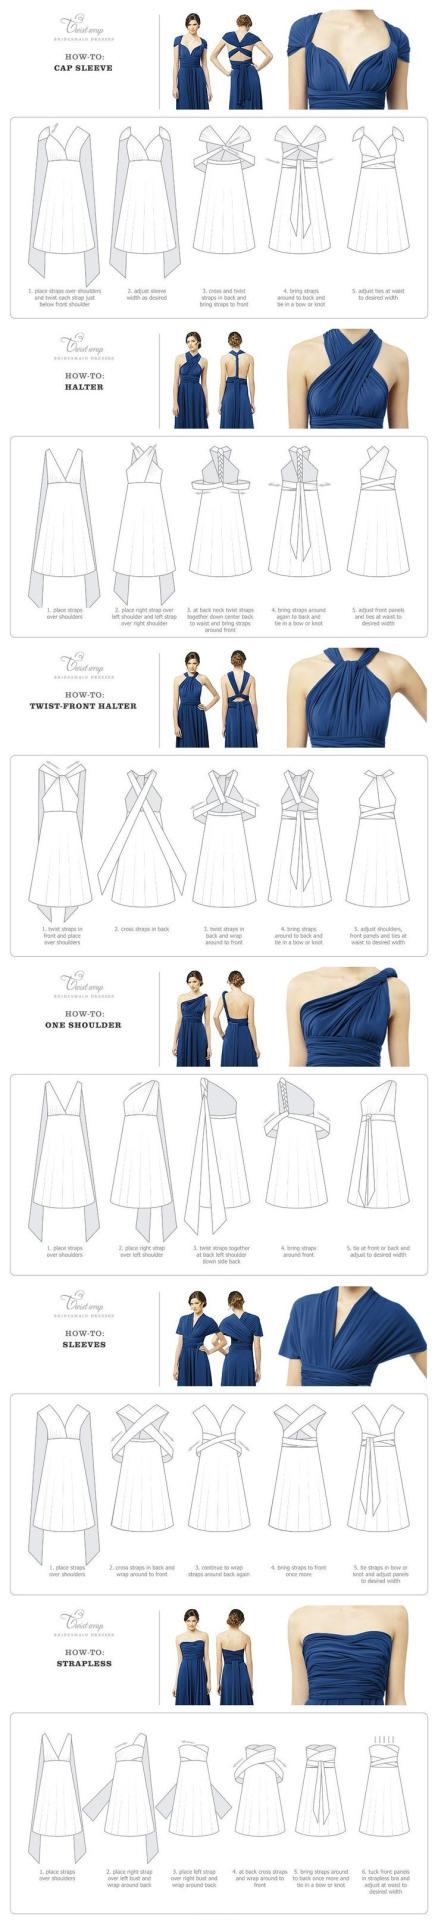 13 Kreativ D Abendkleid Boutique17 Spektakulär D Abendkleid Galerie